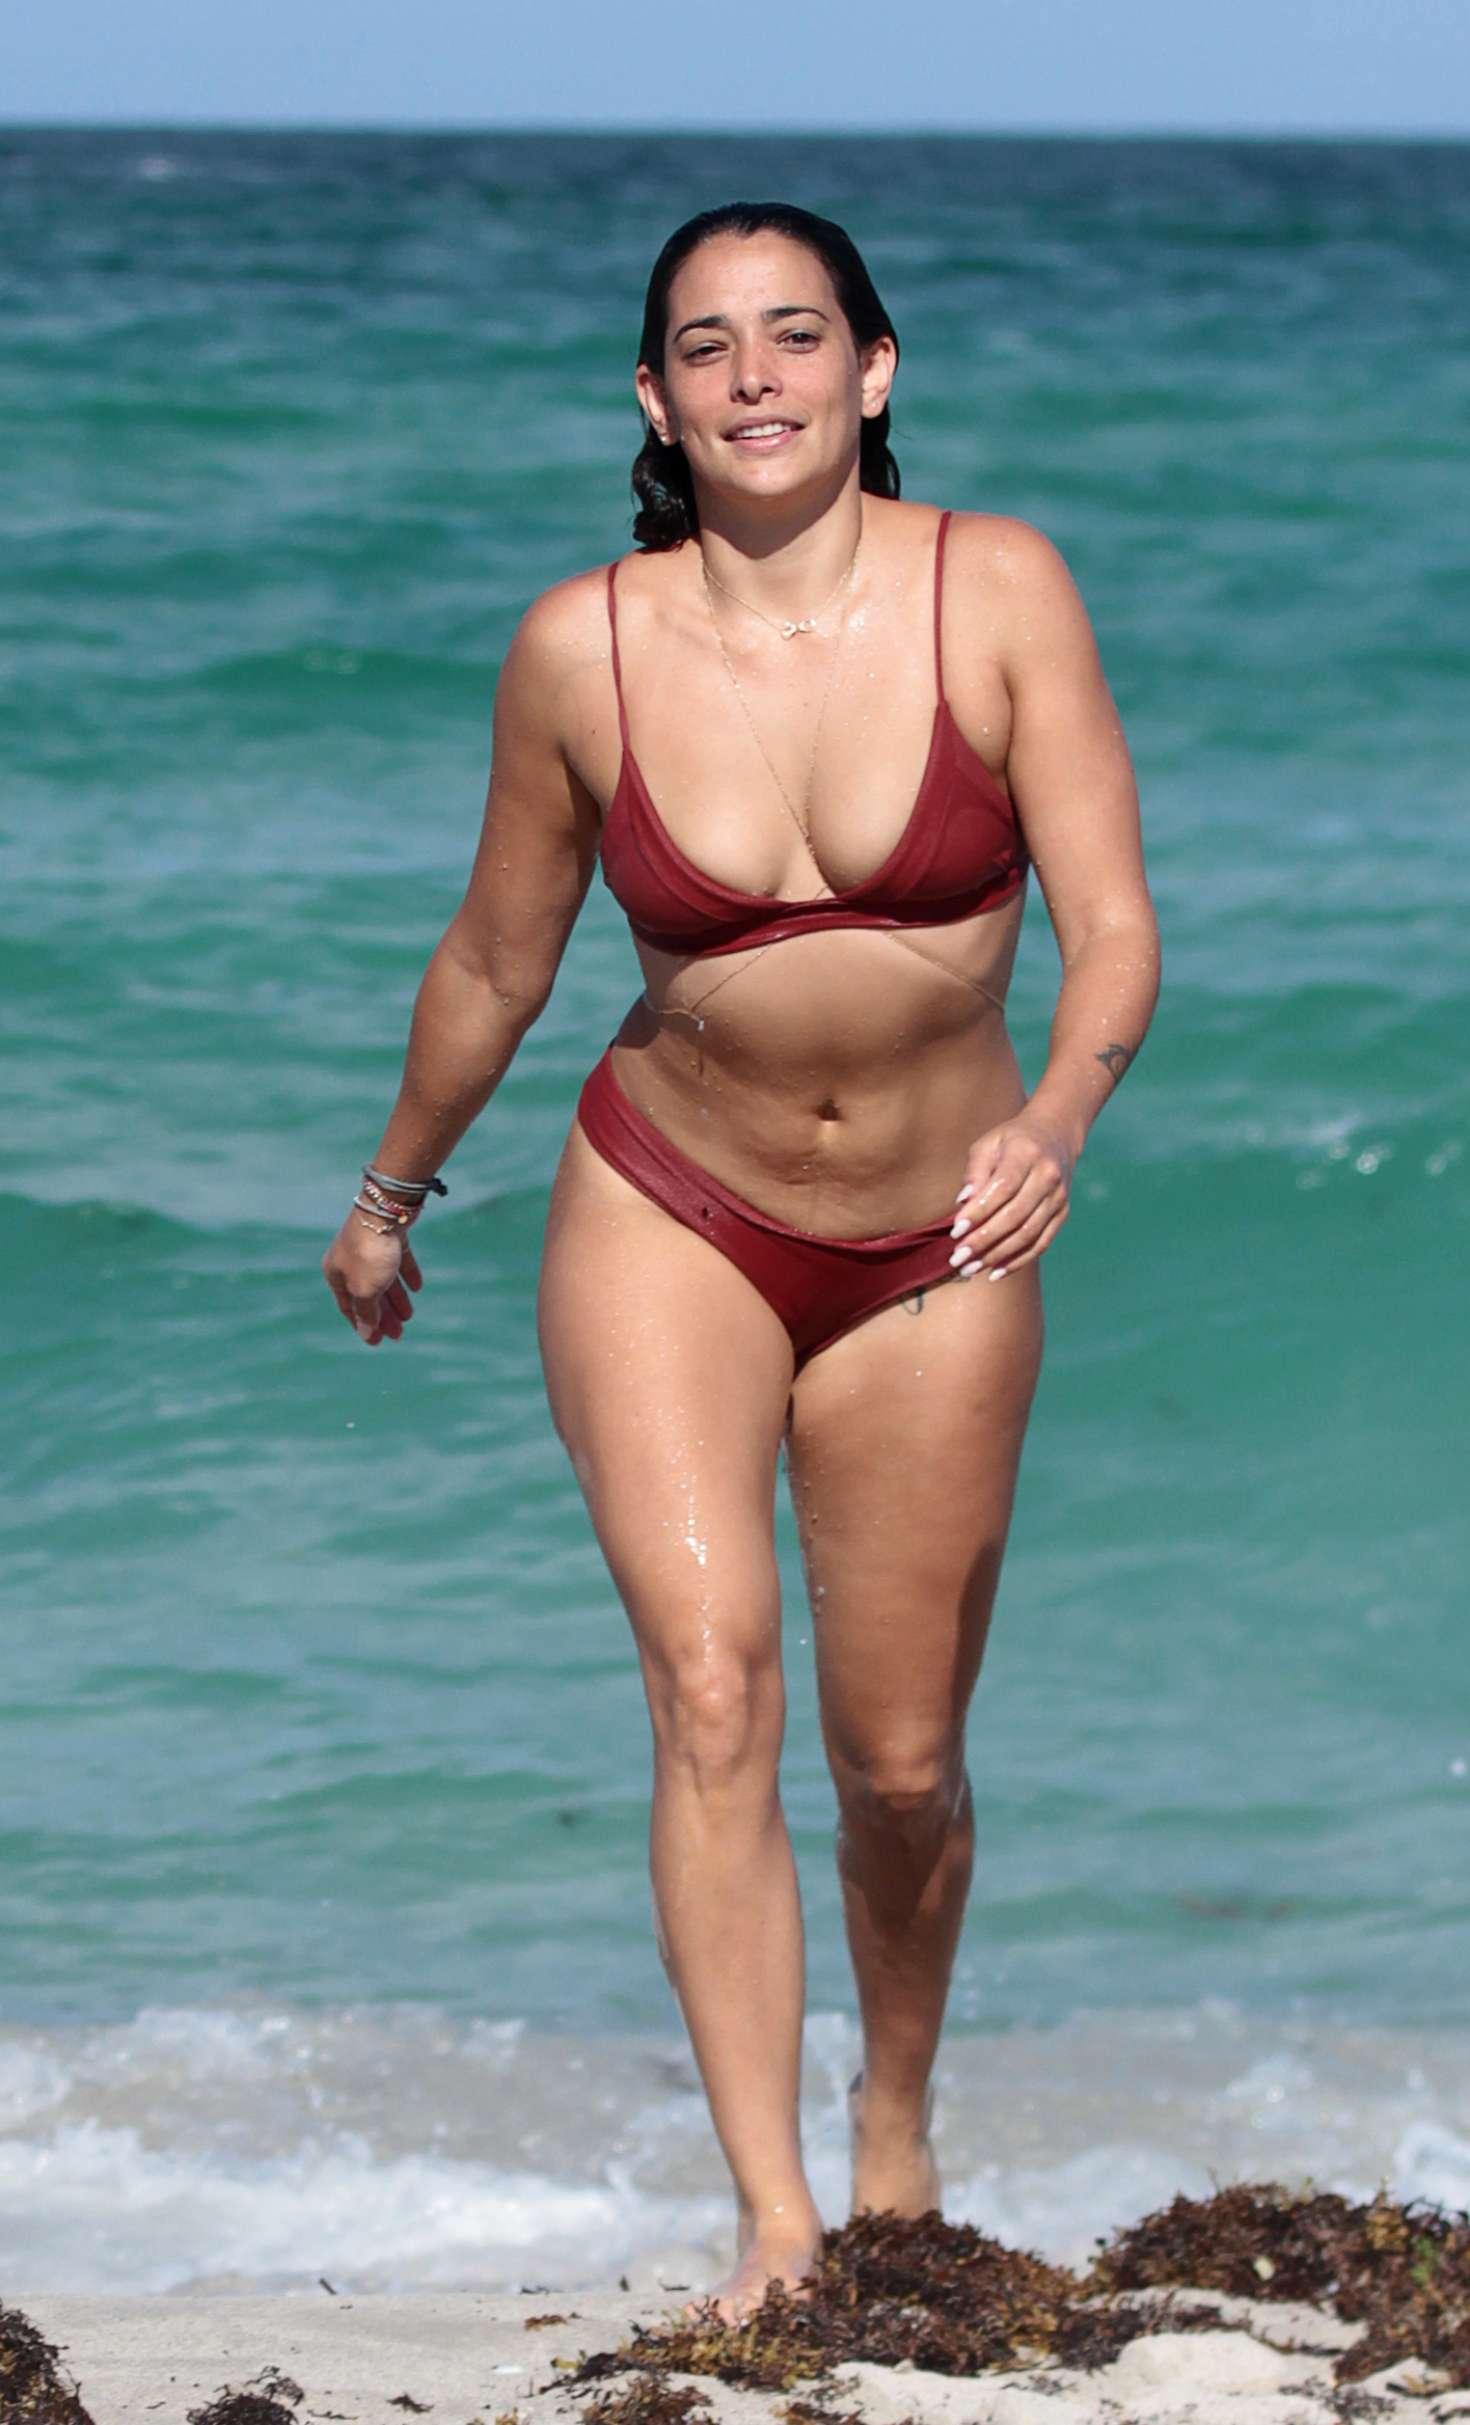 Bikini Natalie Martinez naked (62 foto and video), Ass, Sideboobs, Instagram, butt 2006